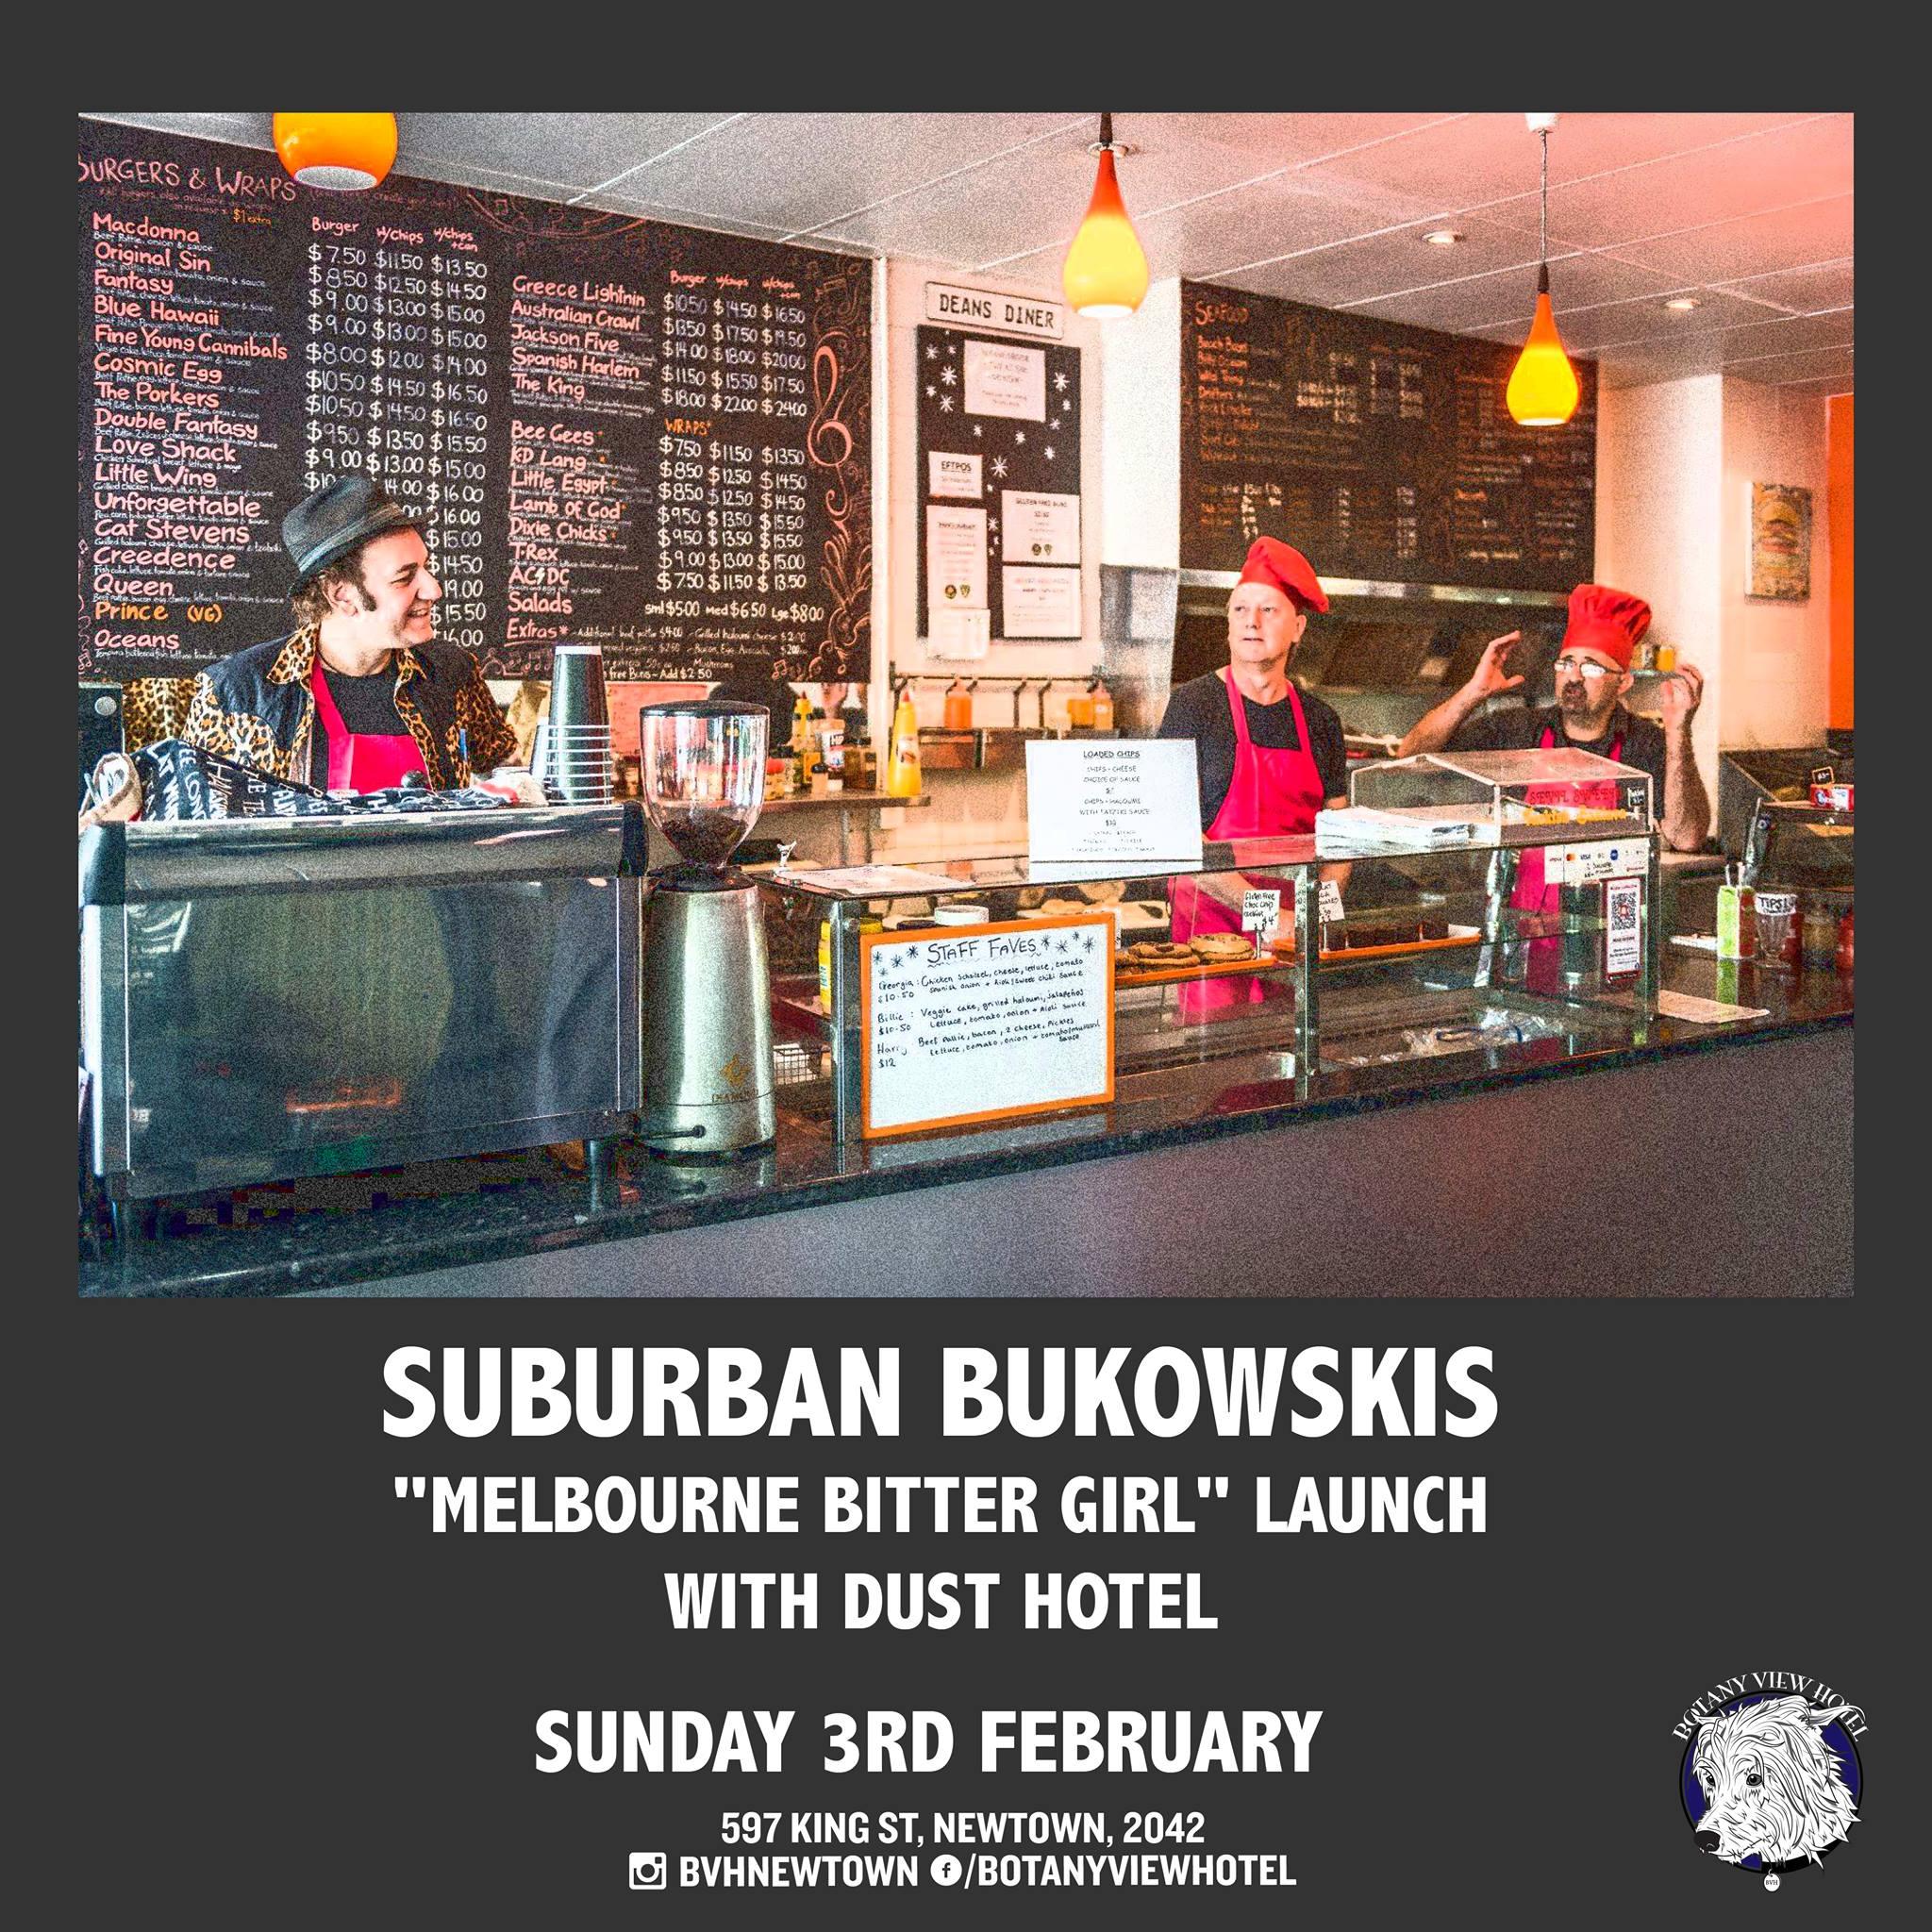 Melbourne Bitter Girl single launch